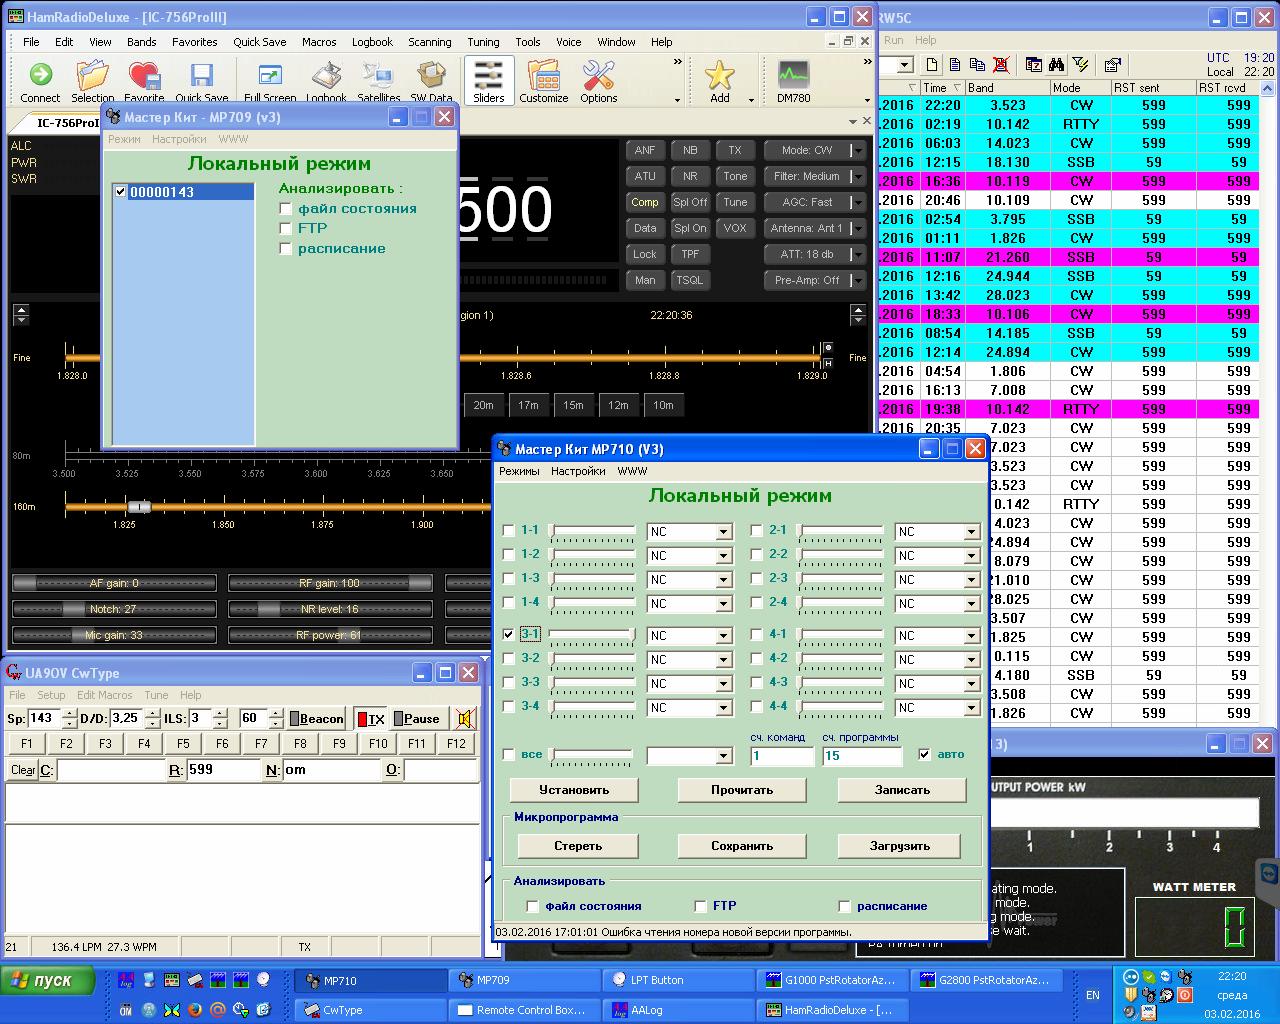 Нажмите на изображение для увеличения.  Название:screenshot4.png Просмотров:68 Размер:381.7 Кб ID:157148